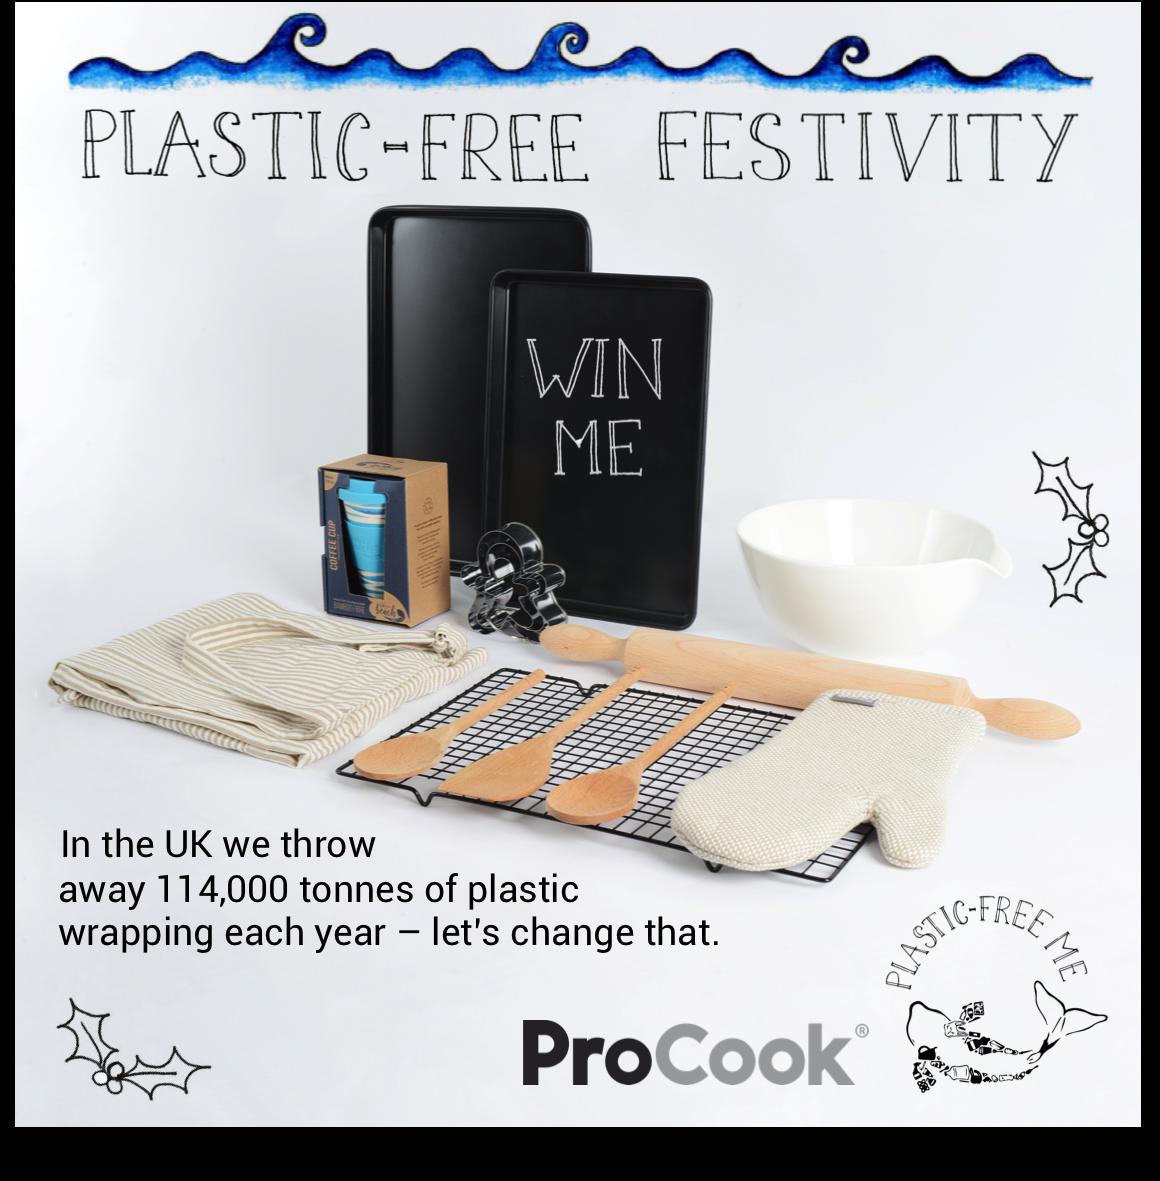 plasticfreefestivity.png